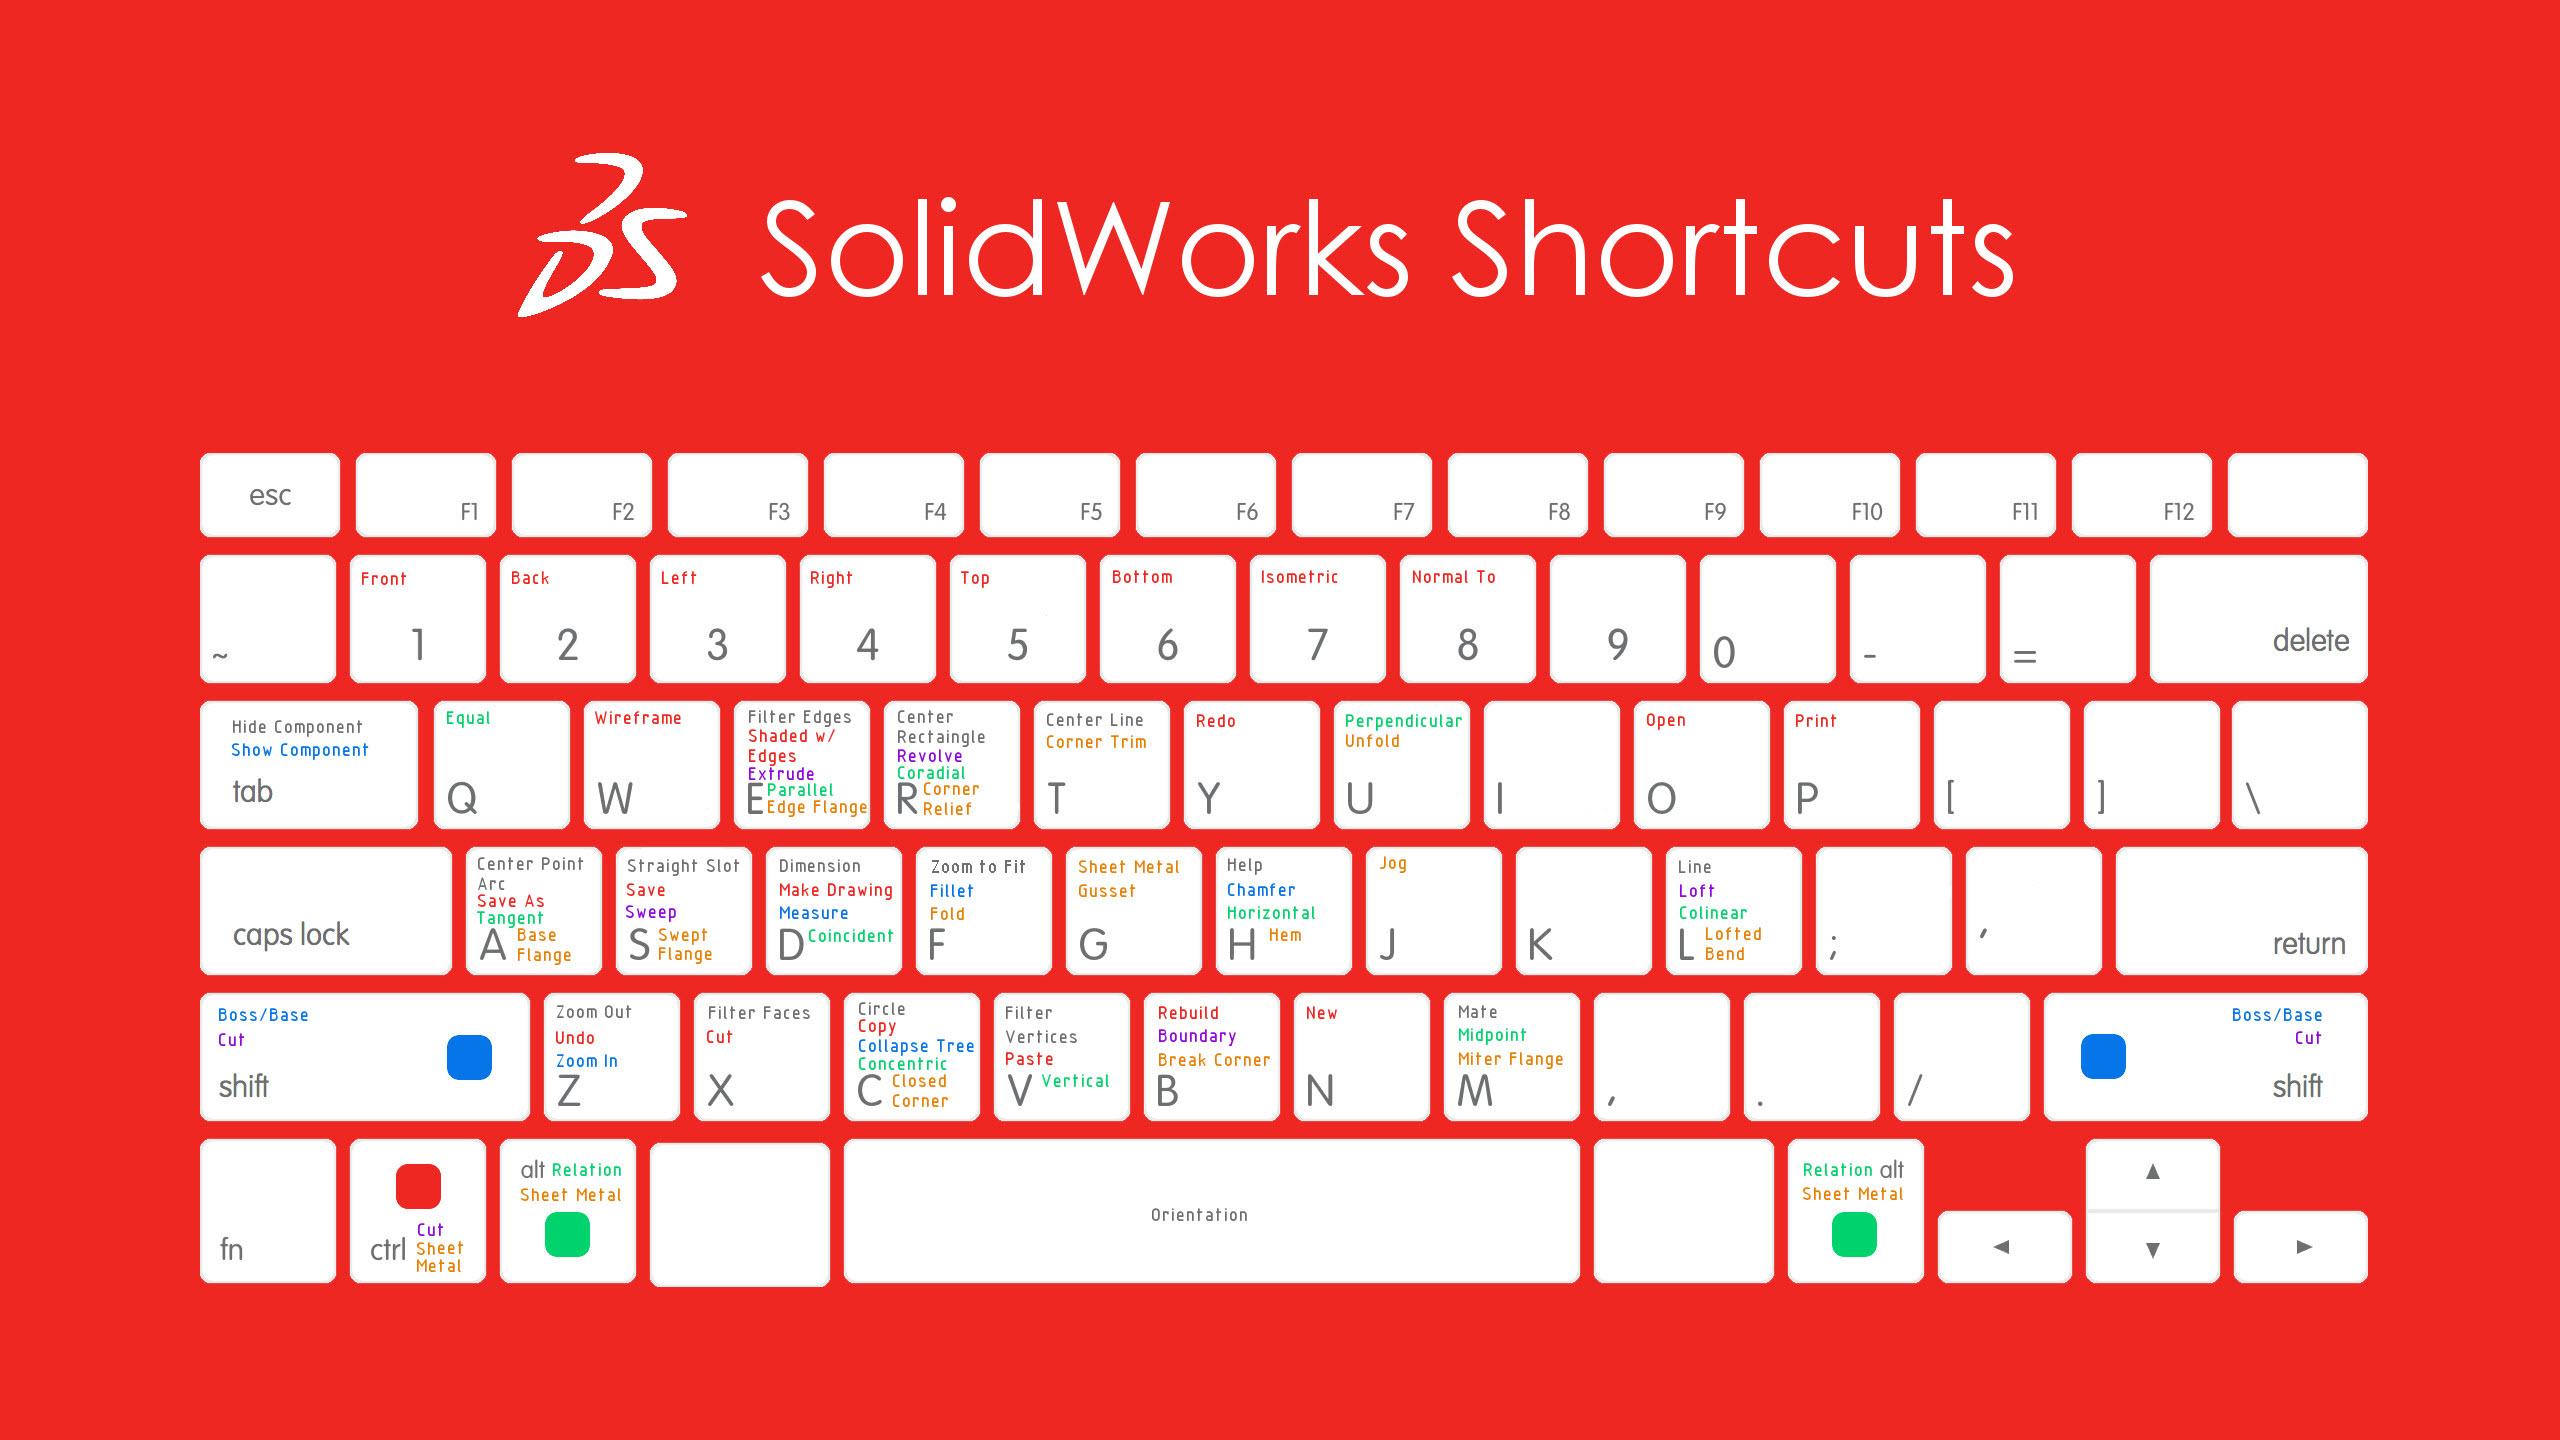 SolidWorks-hortkey-klavesove-zkratky